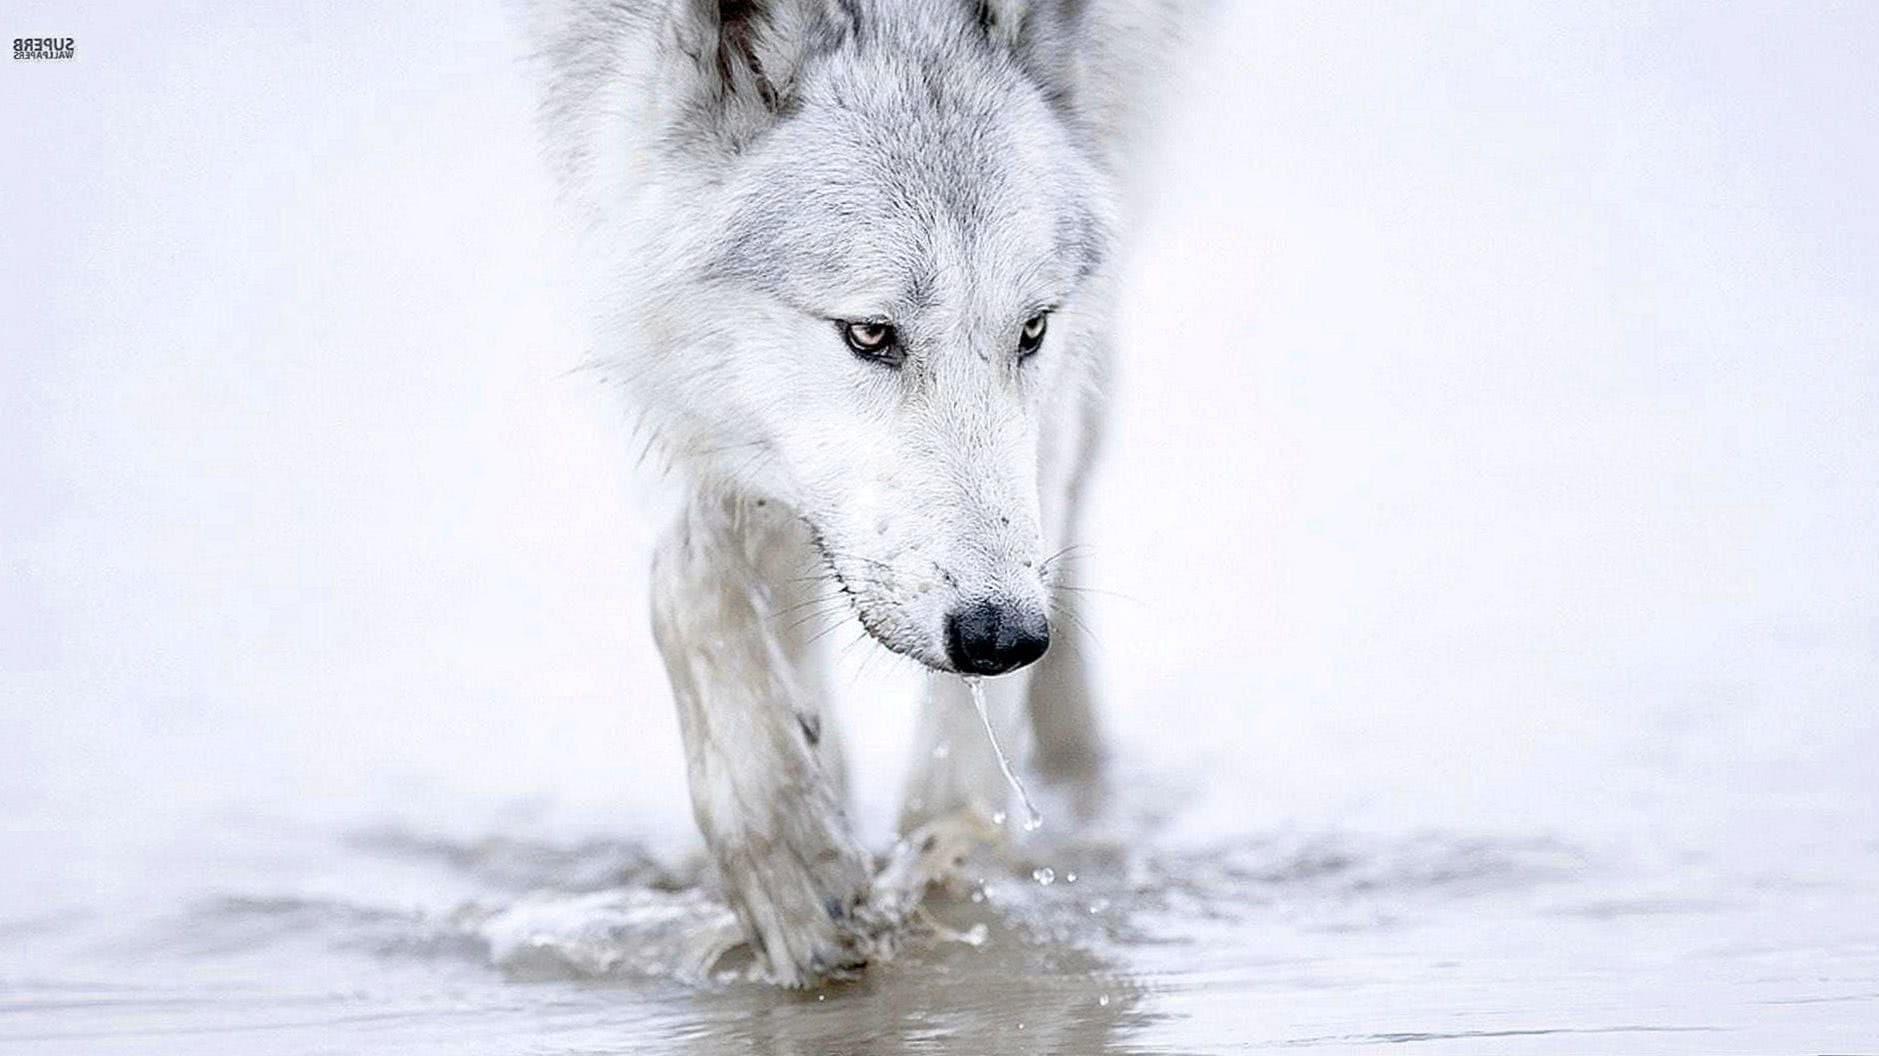 White Wolves Wallpaper HD